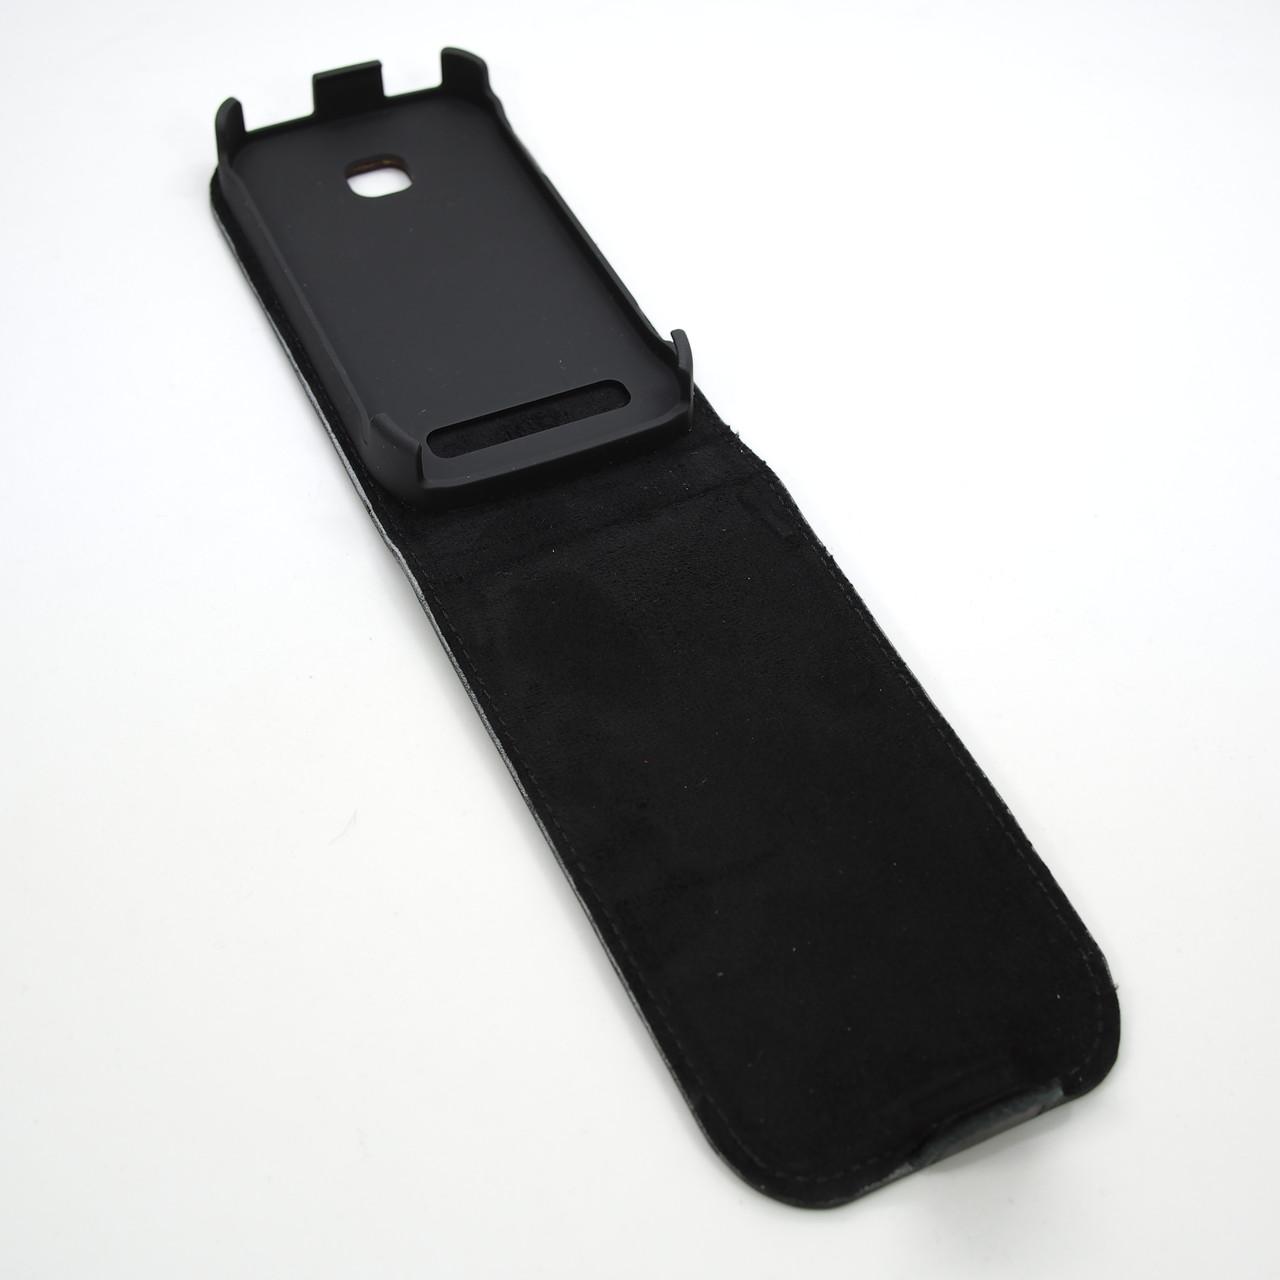 KeepUP Nokia 603 black Для телефона